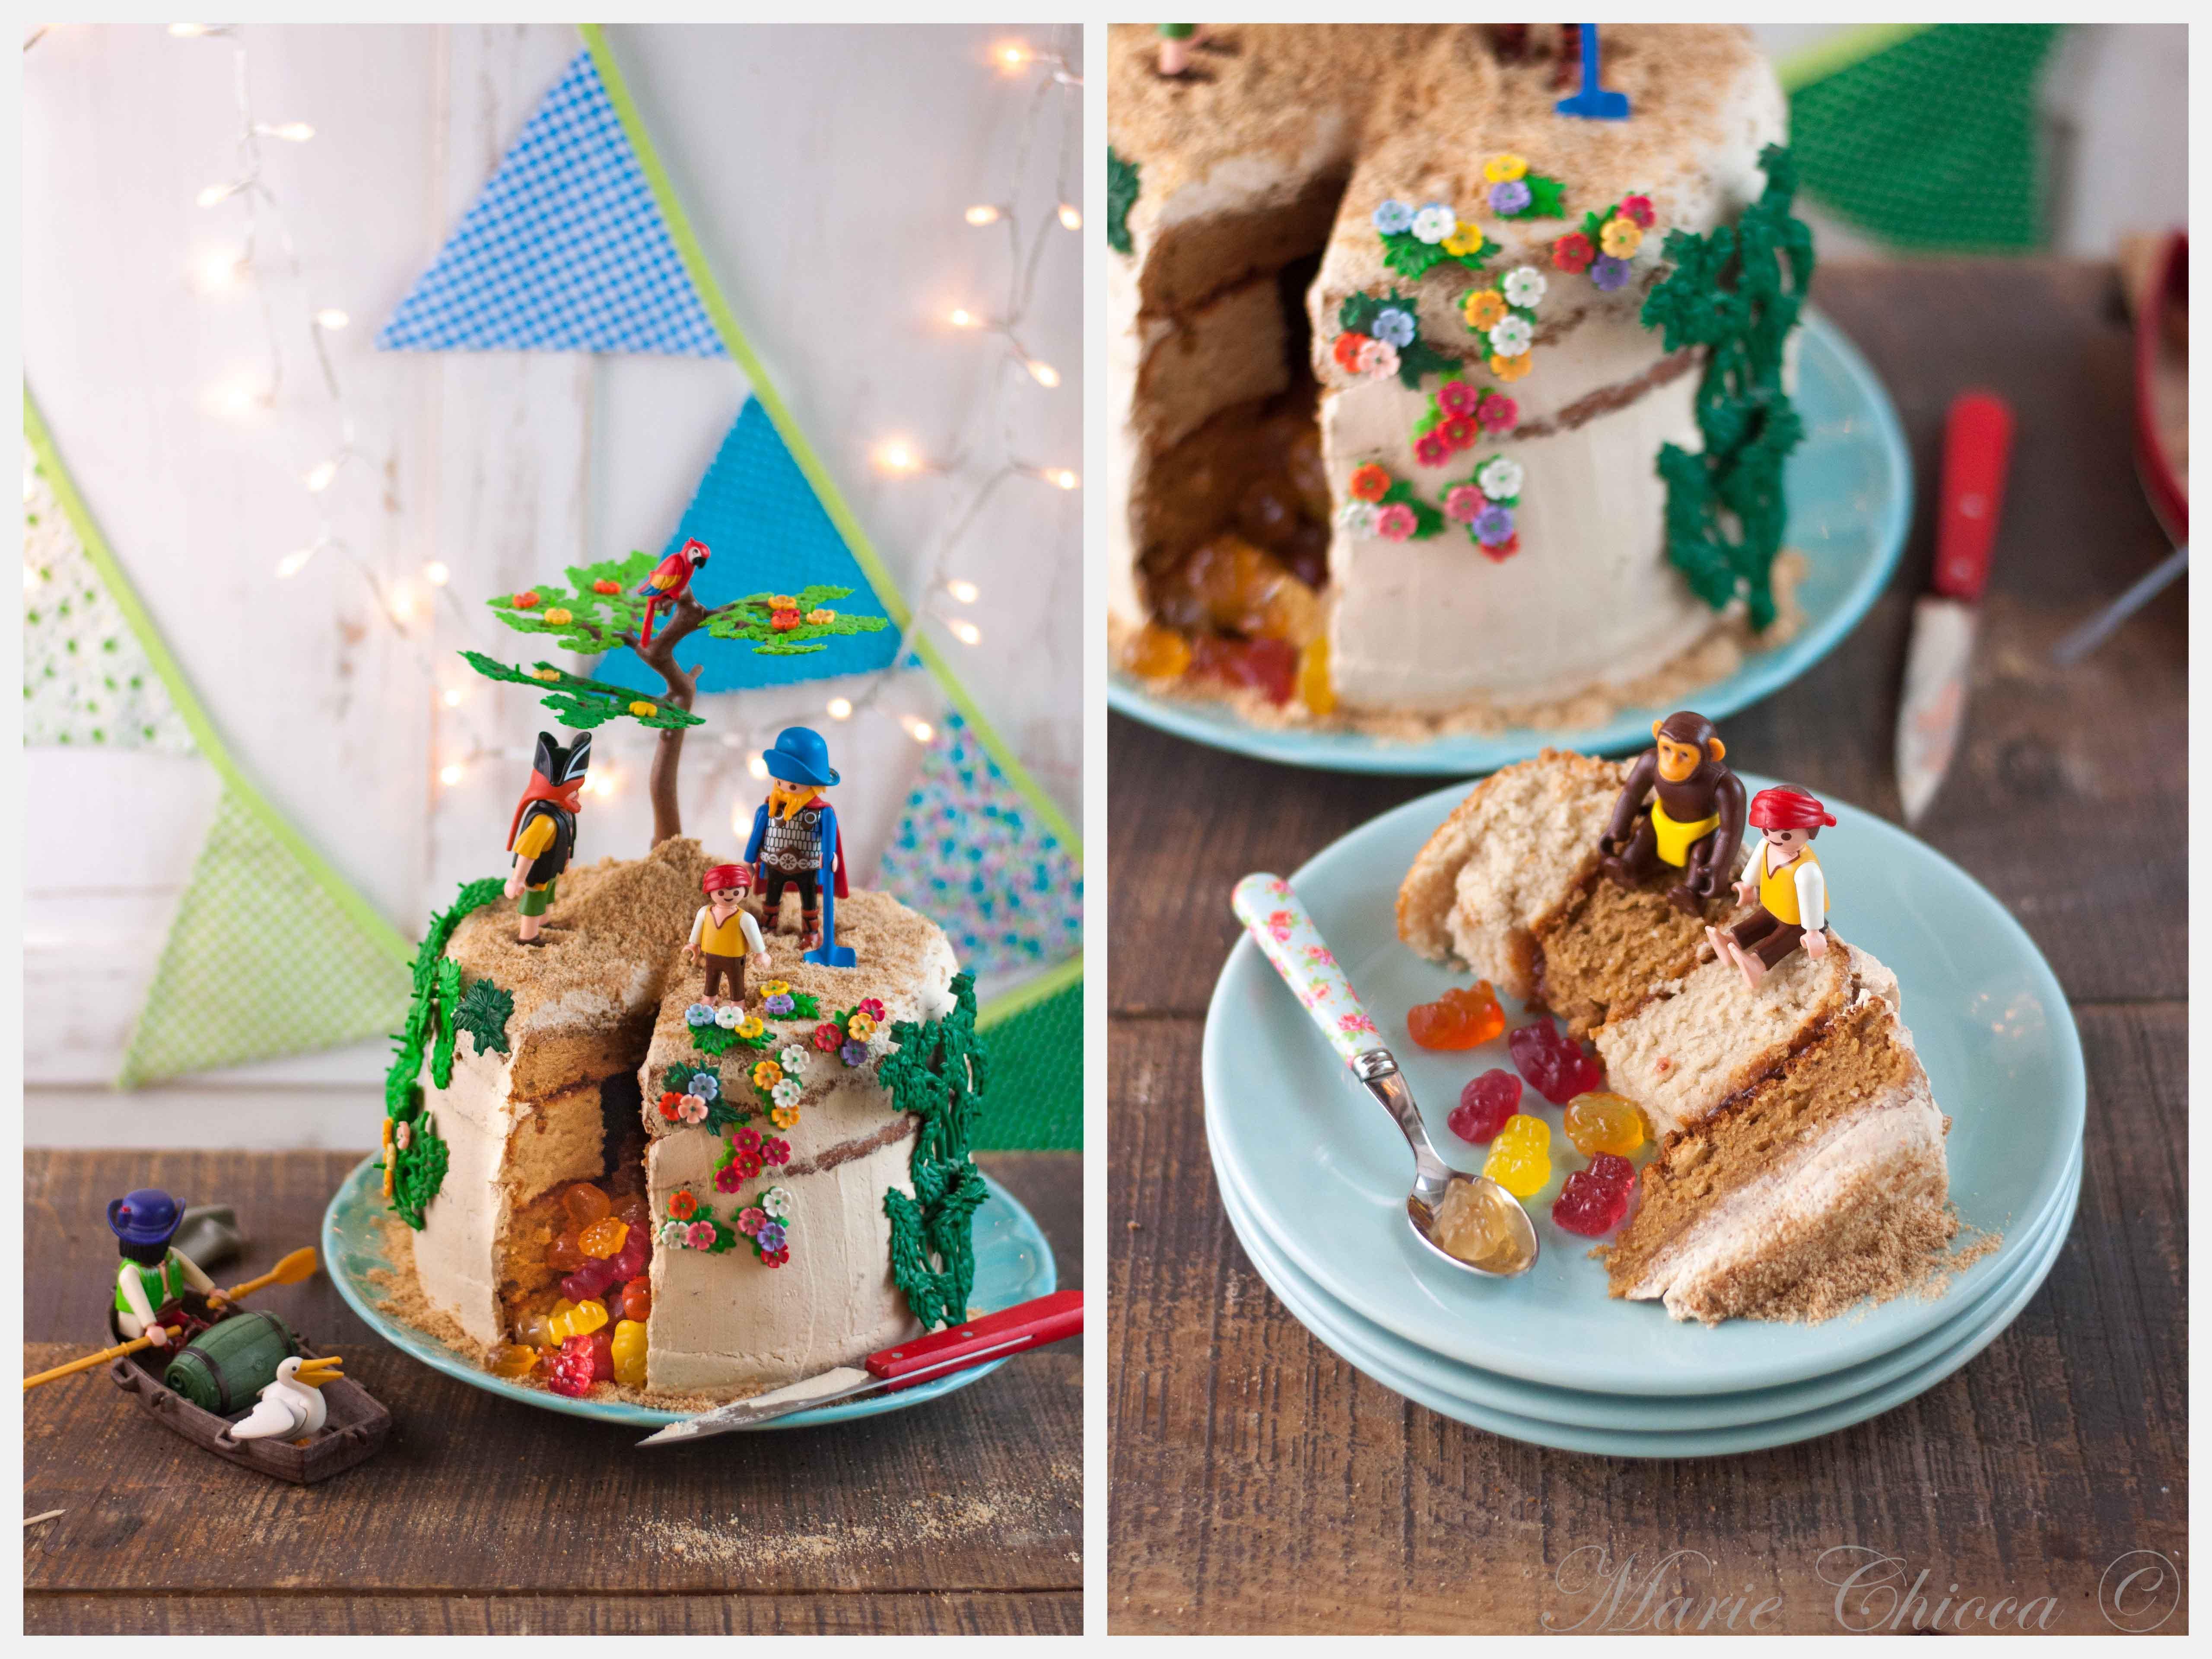 Gâteau pinata île au trésor